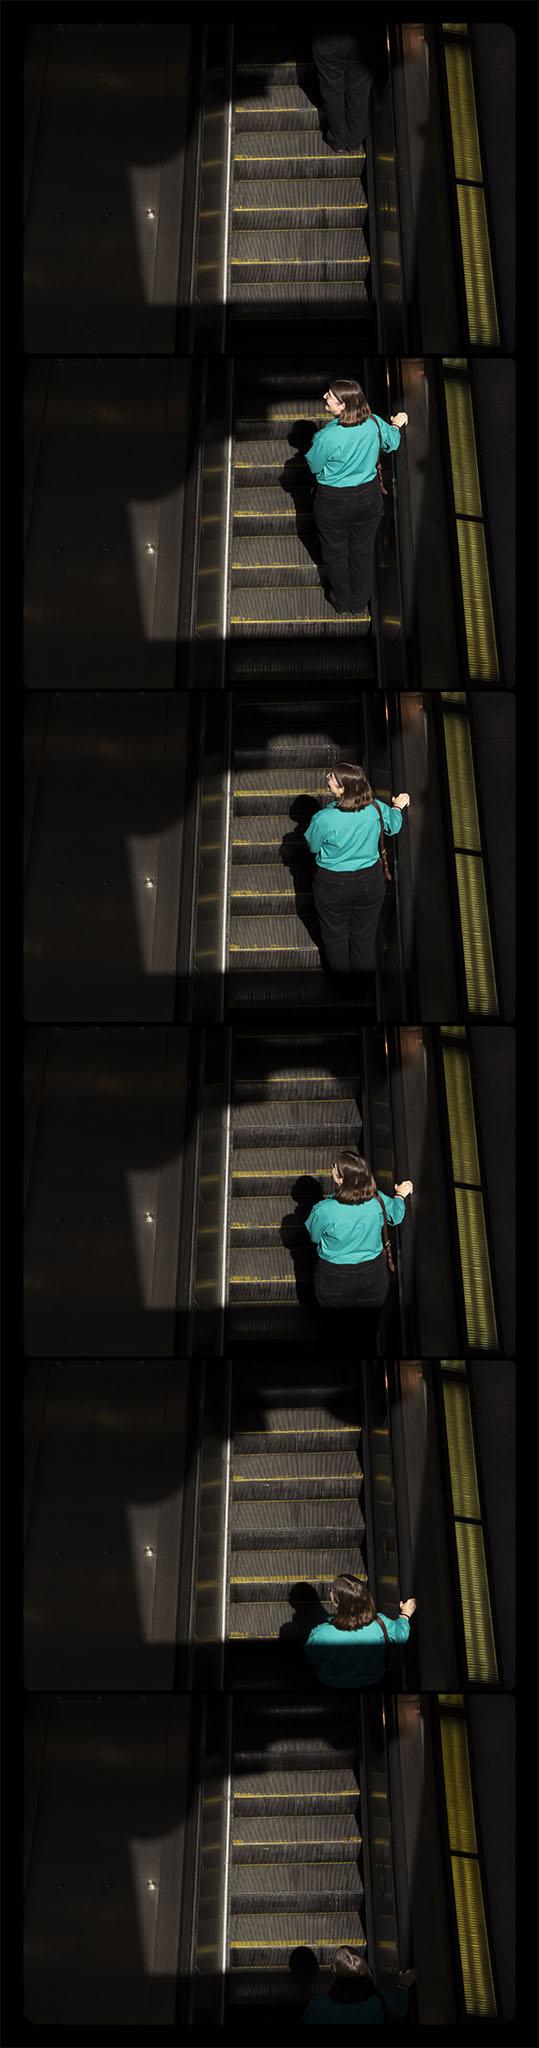 Metro Rail, Gallery Place Chinatown, 4-21-2012-6739-6744